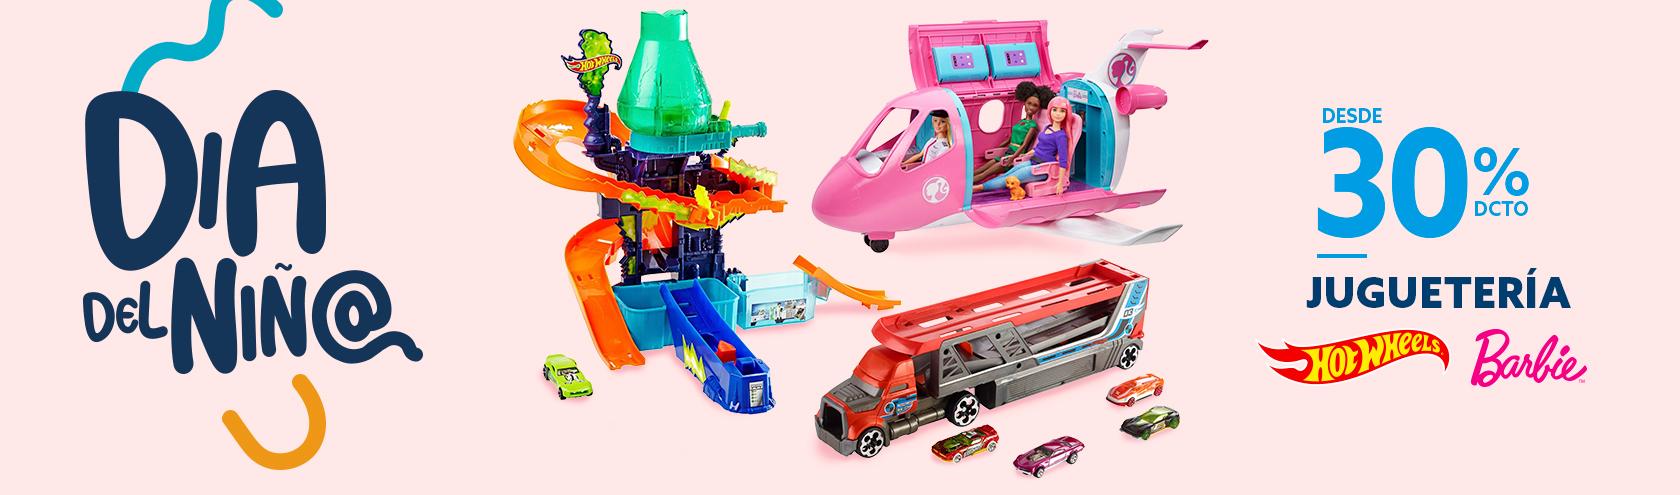 Barbie y Hotwheels desde 30% dcto